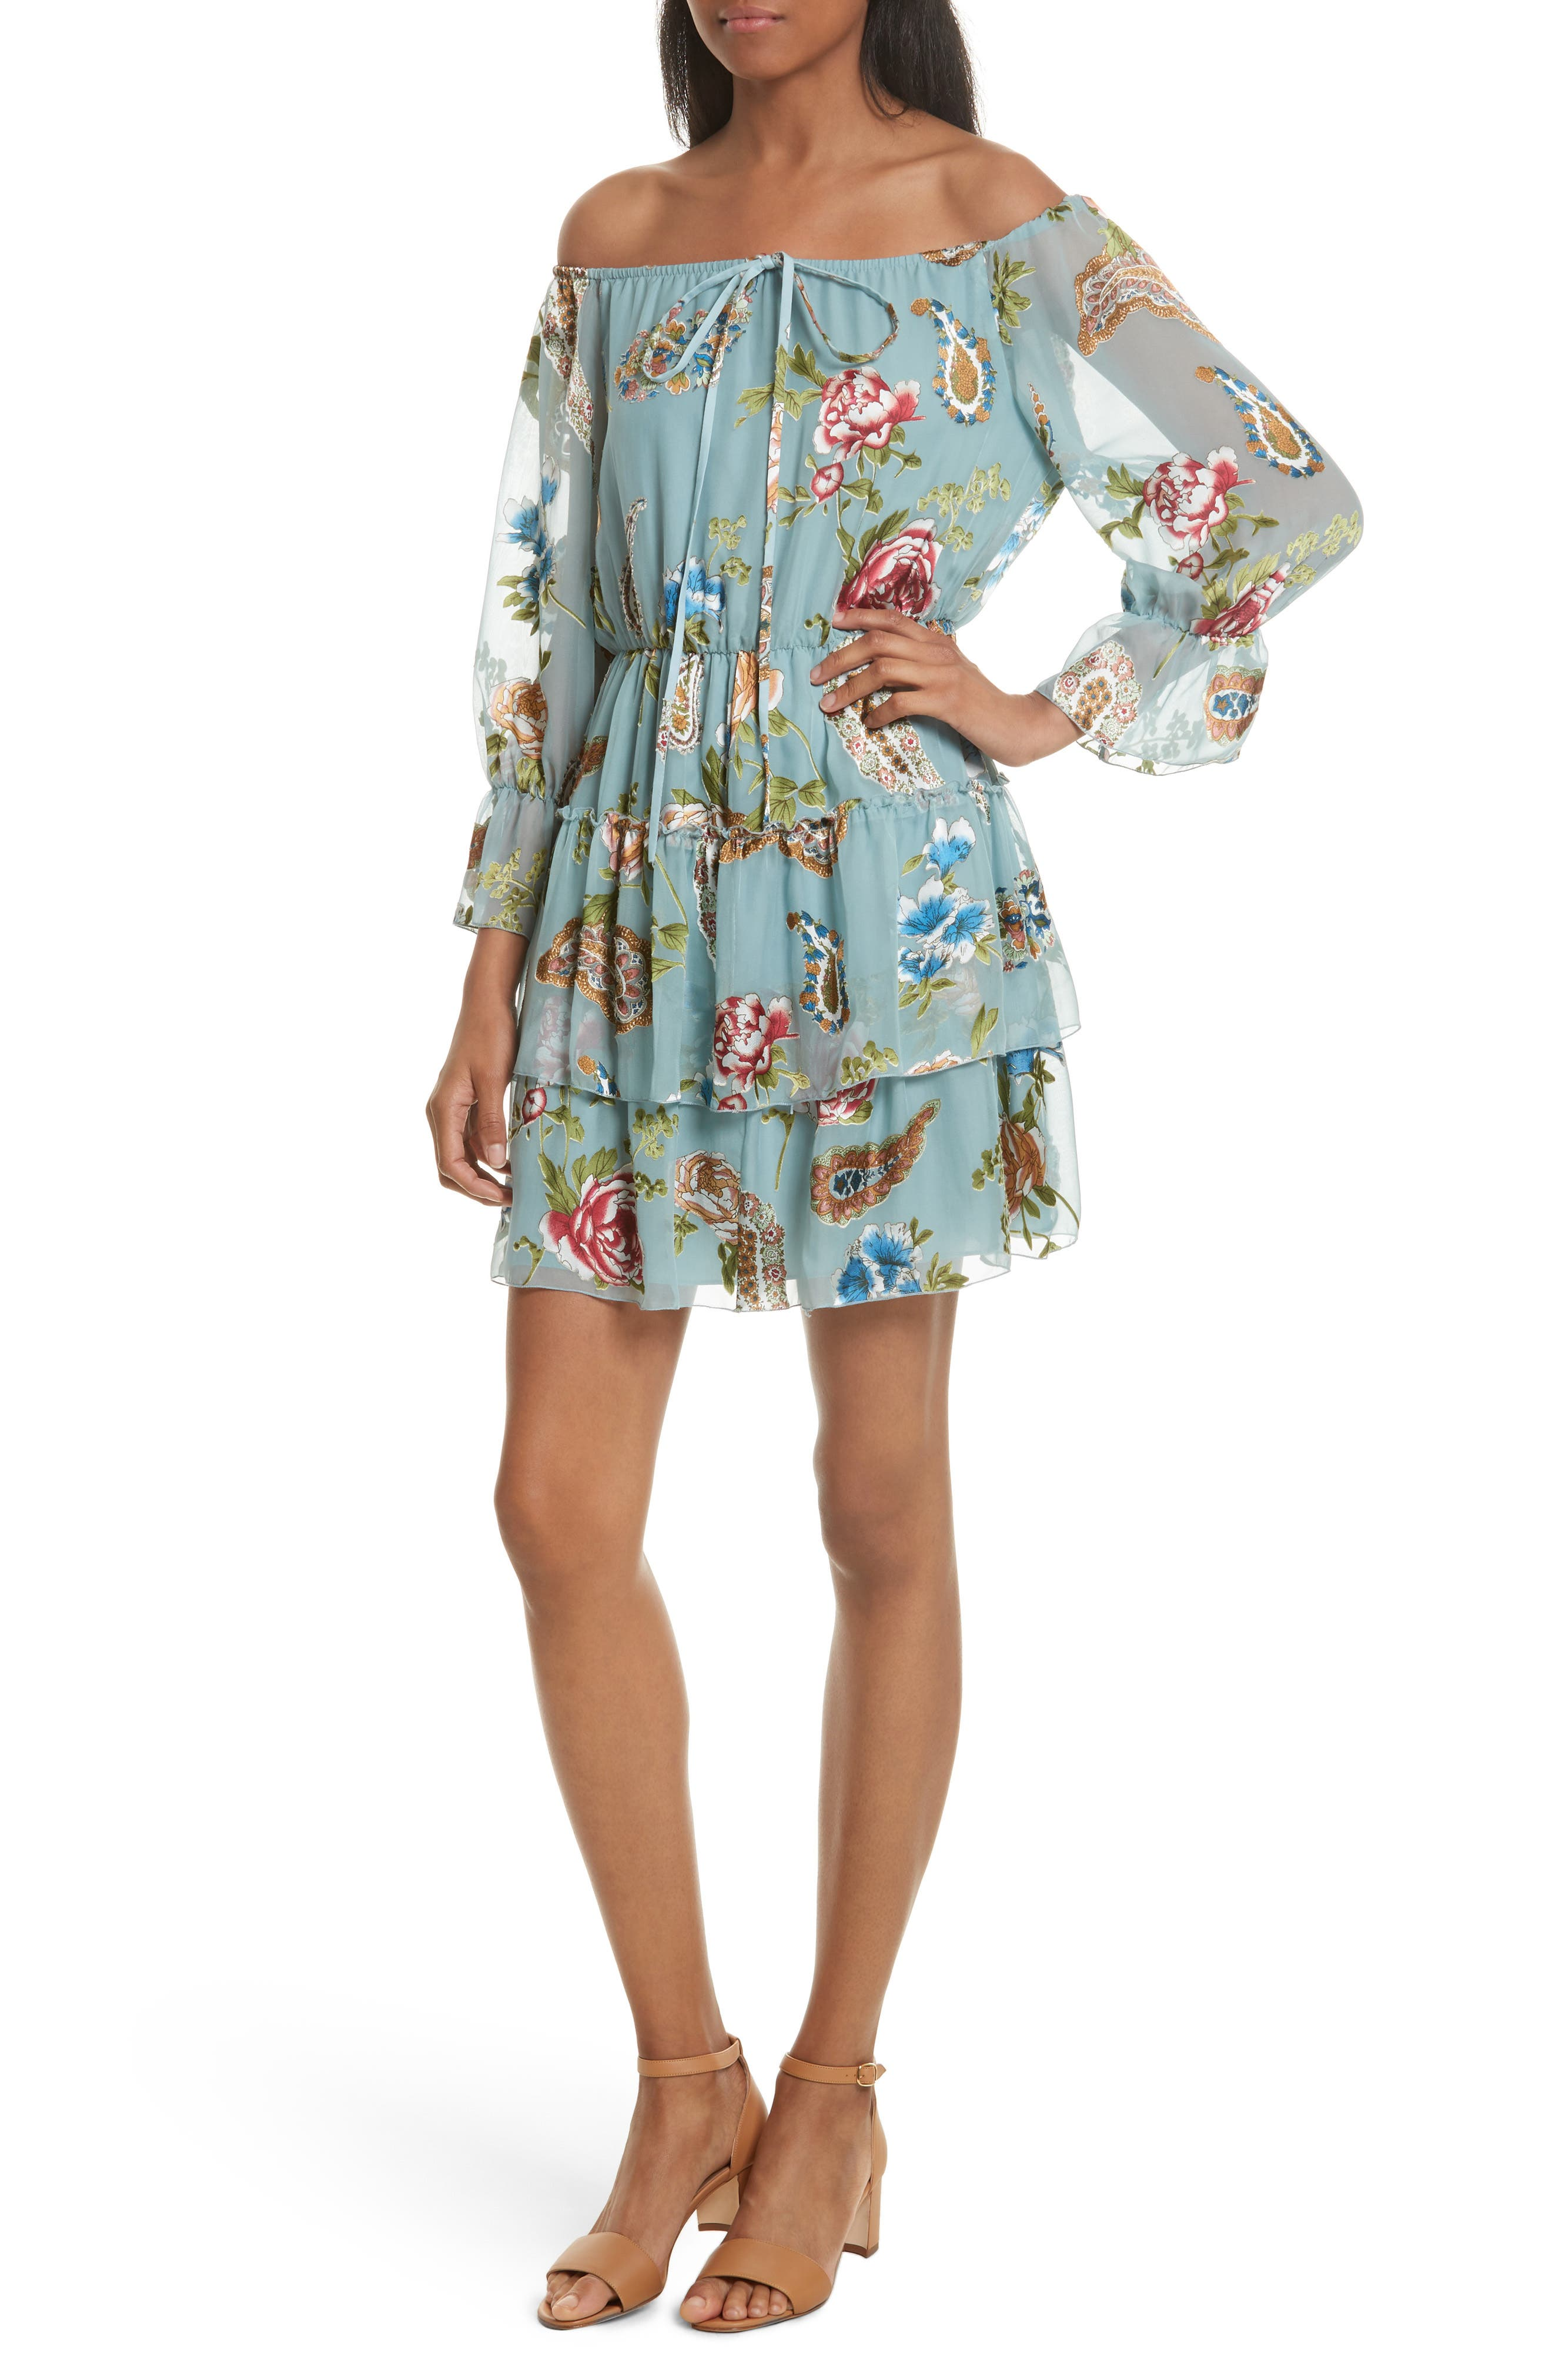 Waylon Off the Shoulder Blouson Dress,                         Main,                         color, Icy Aqua/ Multi